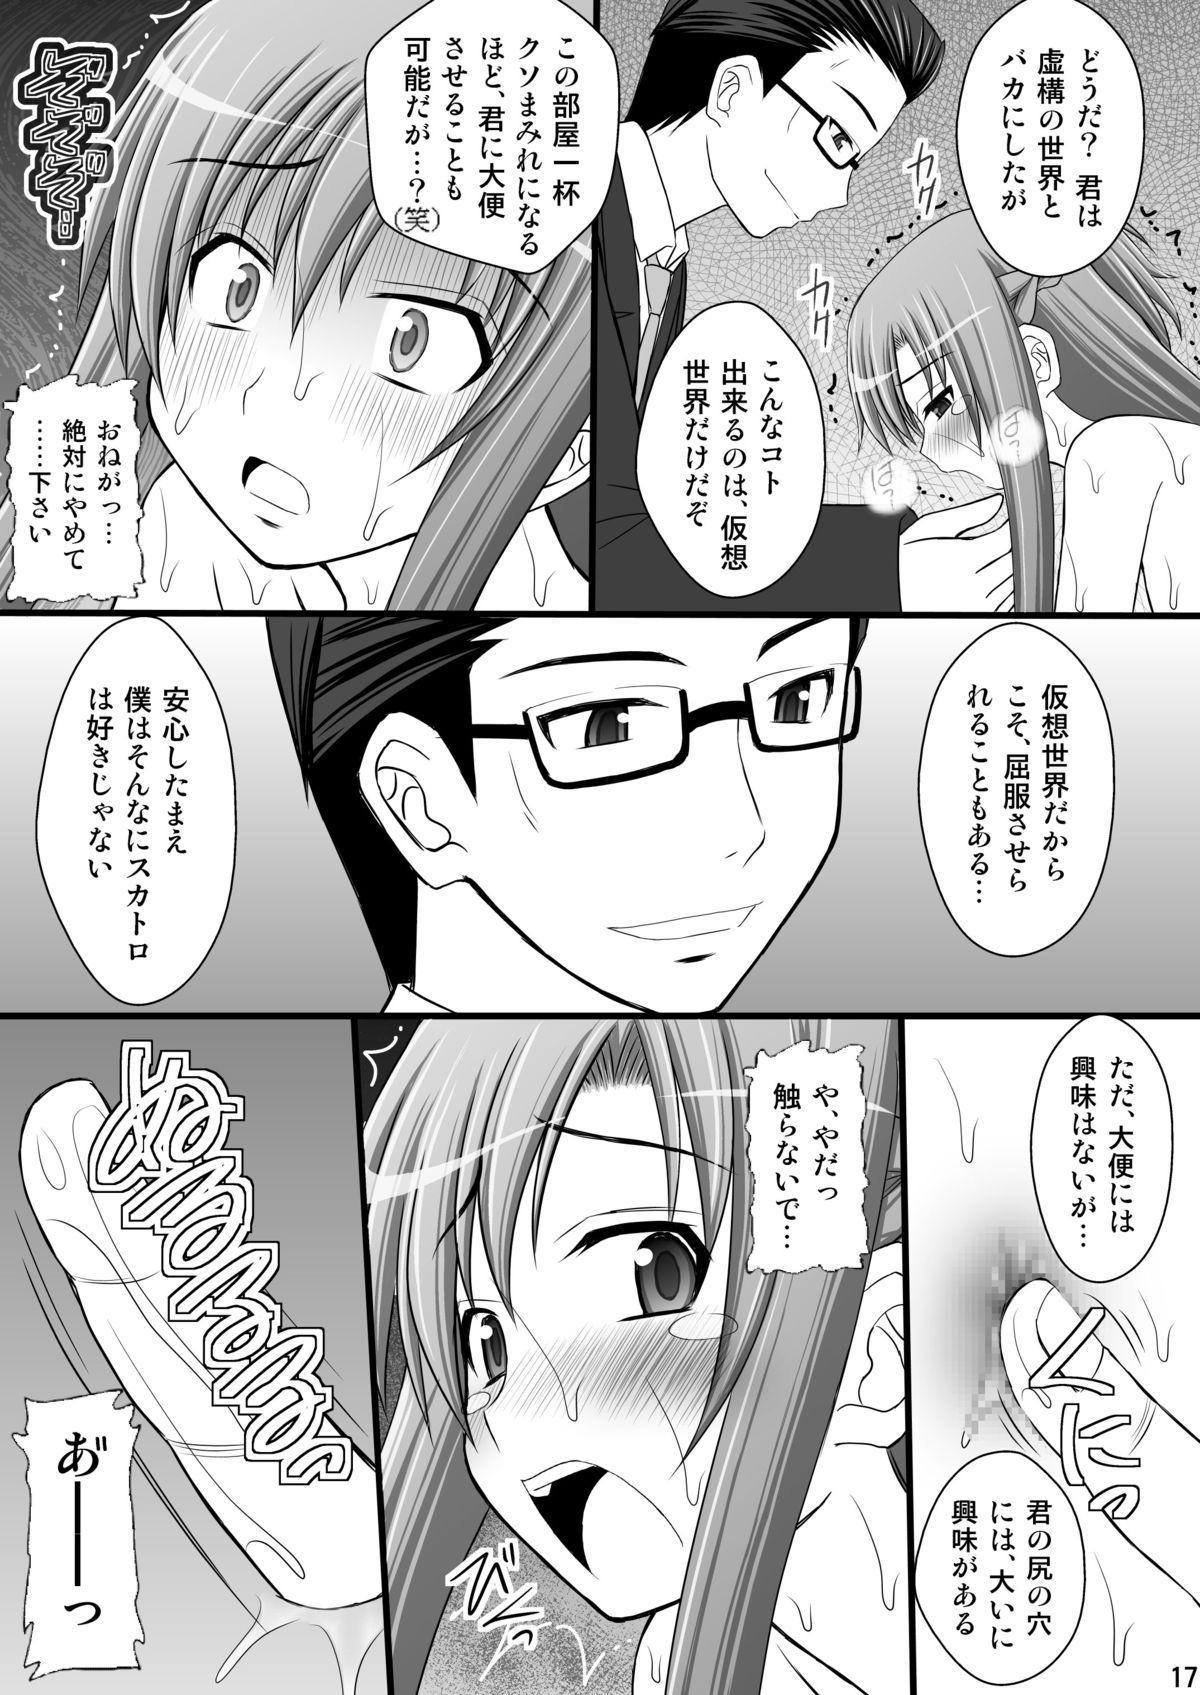 Toraware Hime I - System Master Nyaa Sakarae nee 15